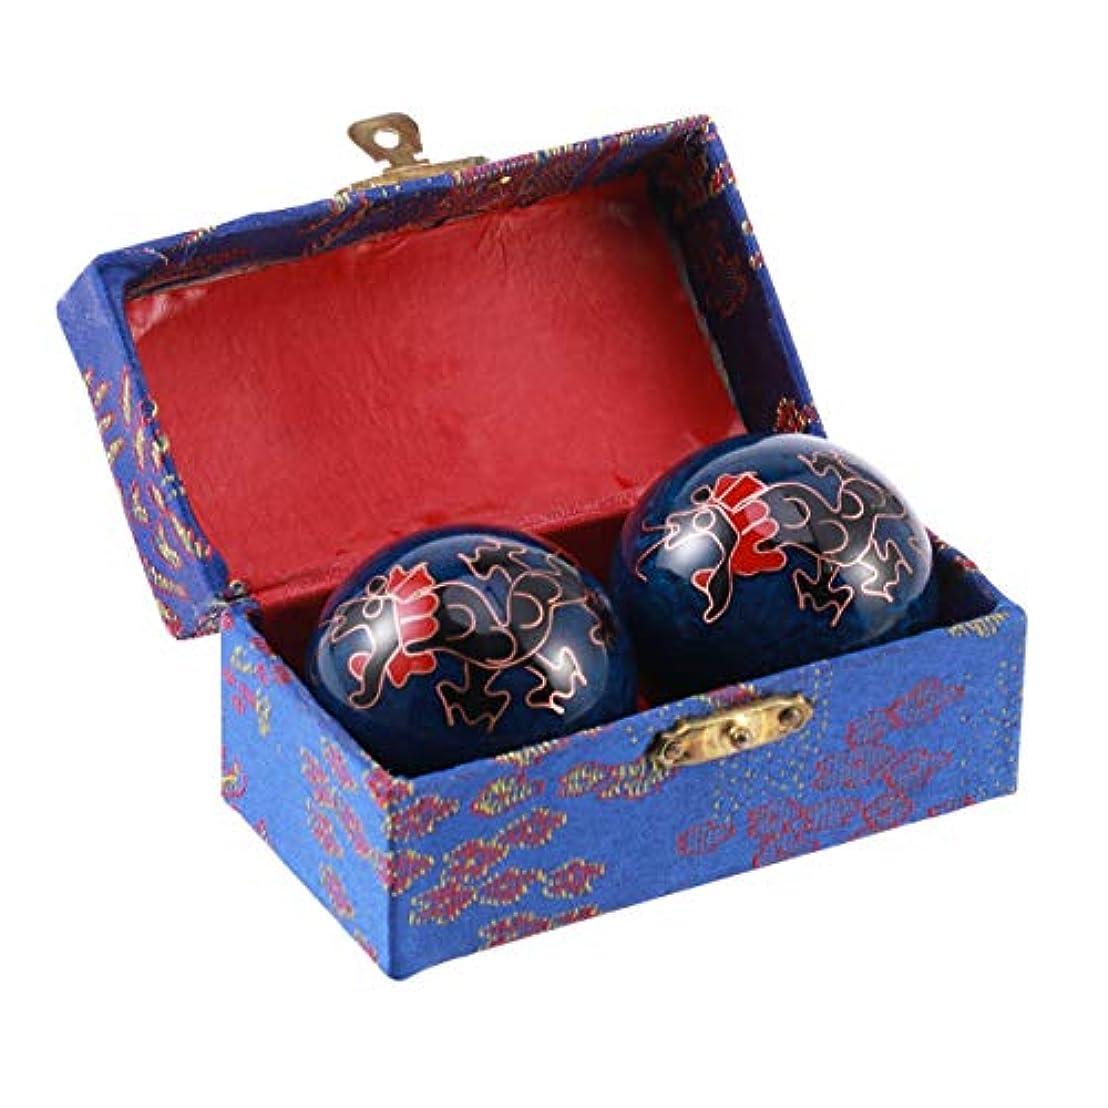 SUPVOX マッサージ ボール リラックスボール 健康器具 血行促進 頭痛 浮腫み解消 疲労回復 脂肪除去 中国の健康のボール 2個入(ブラックドラゴンズとフェニックス)